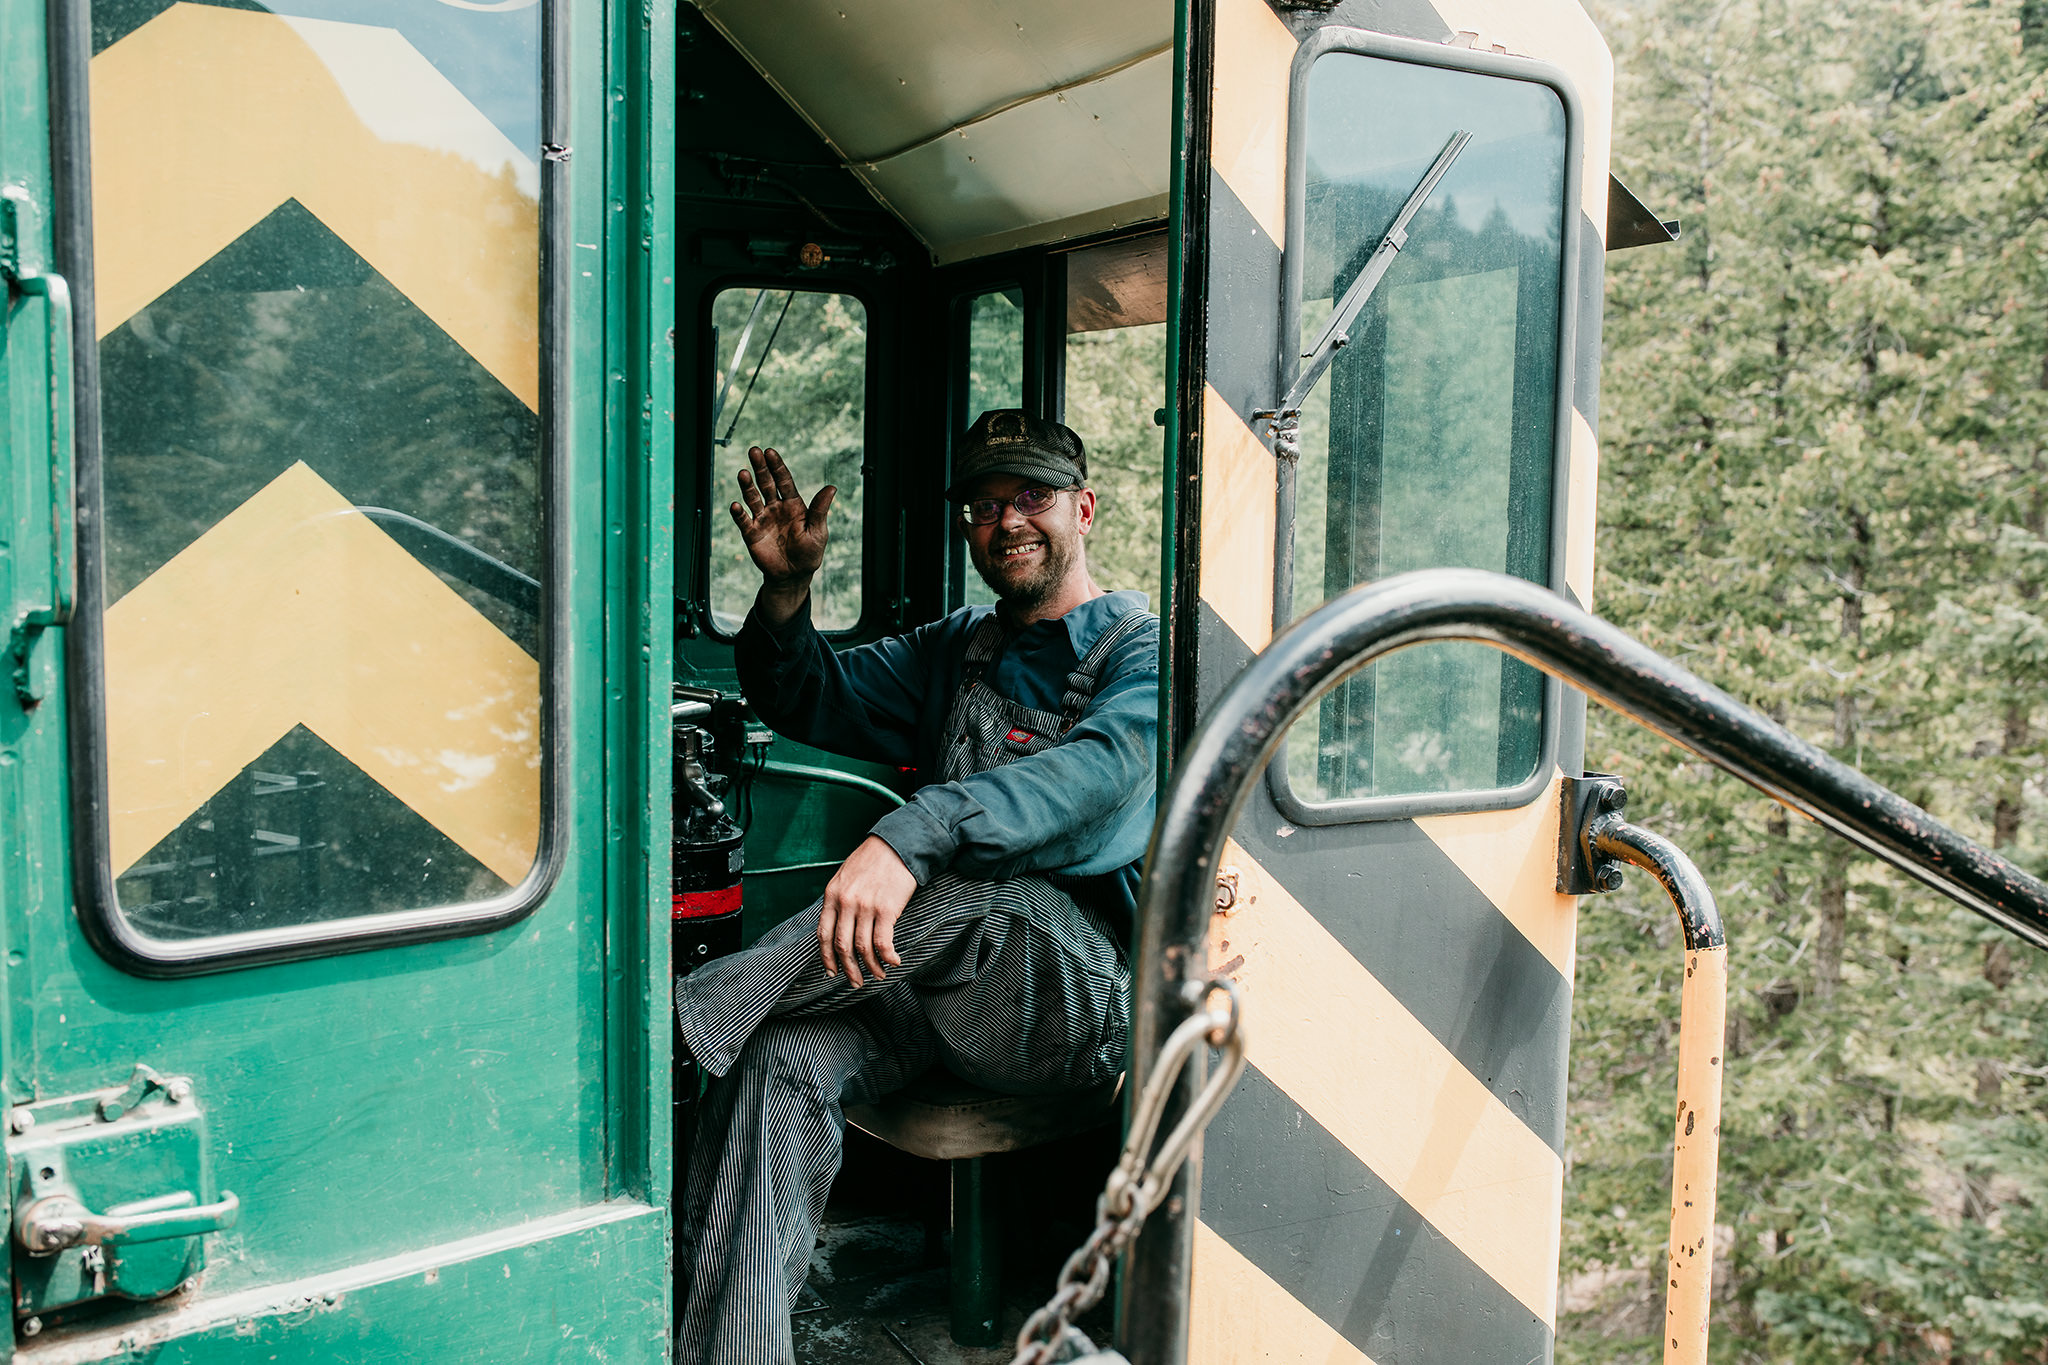 Georgetown Loop Railroad | Rural Life Photography | Mike Wade